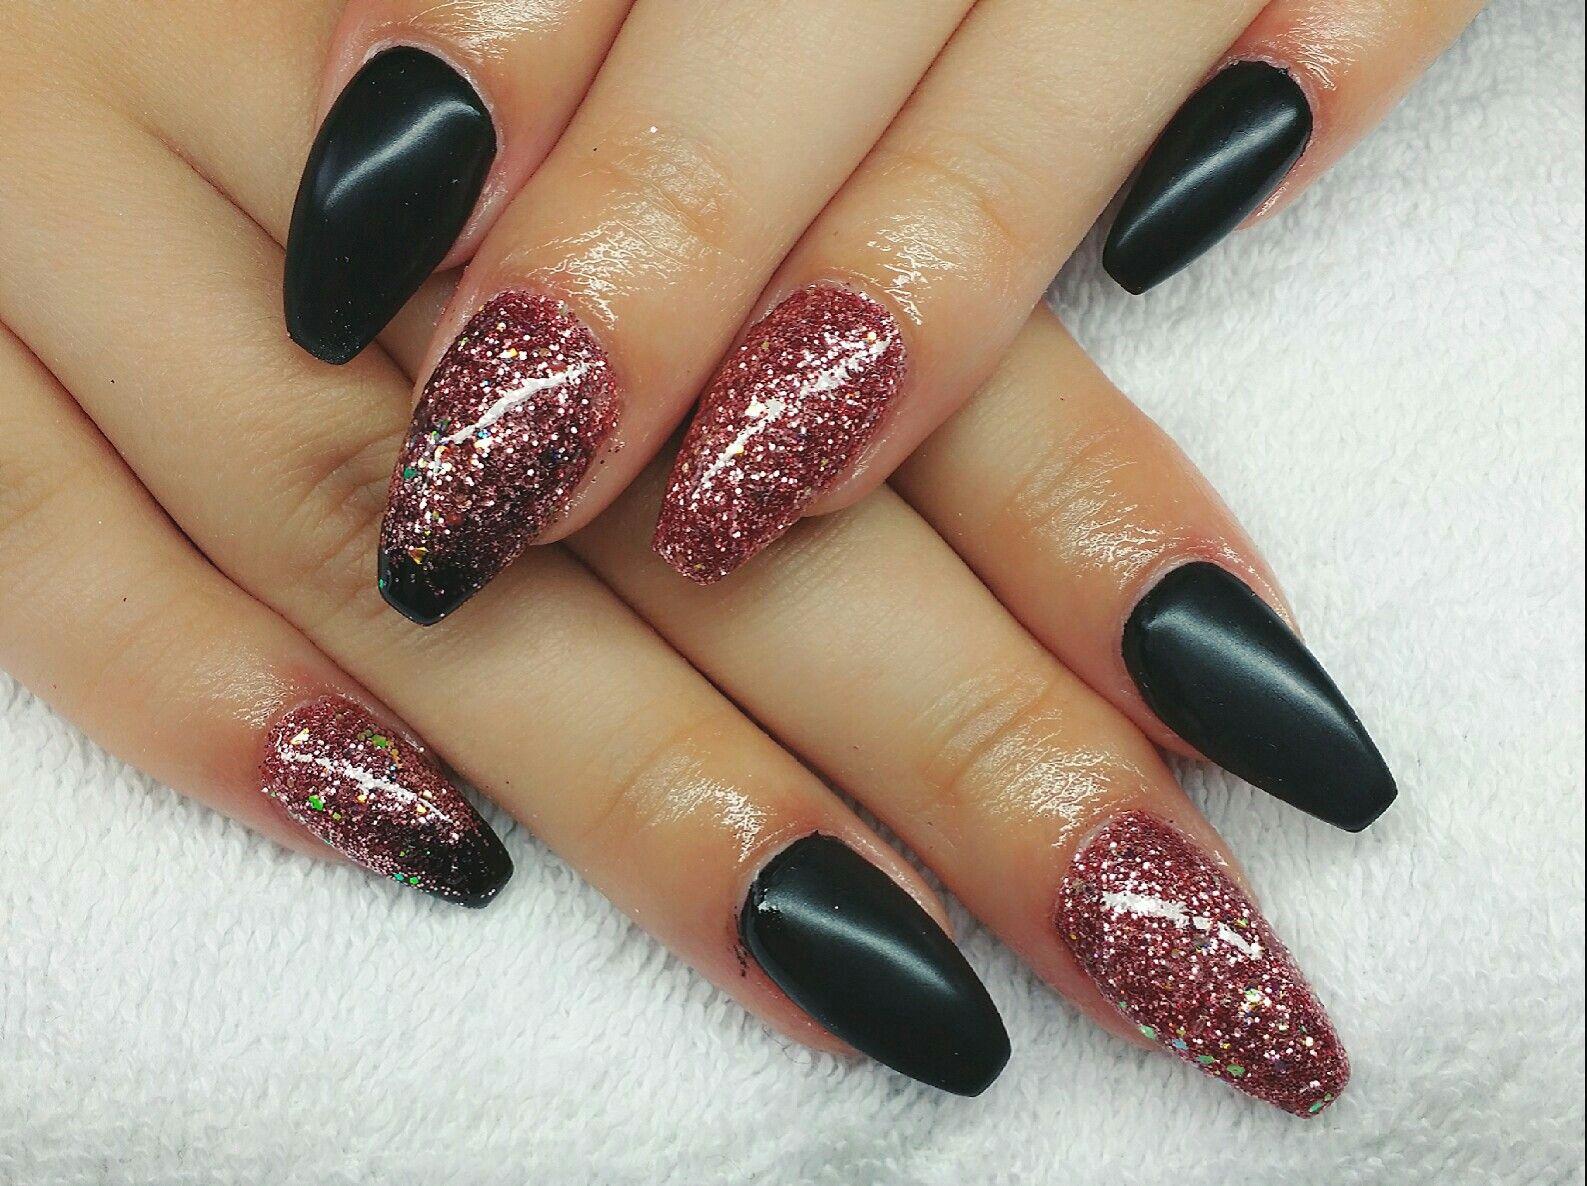 Nail Design Fullcover | Nails nails nails by me :) | Pinterest